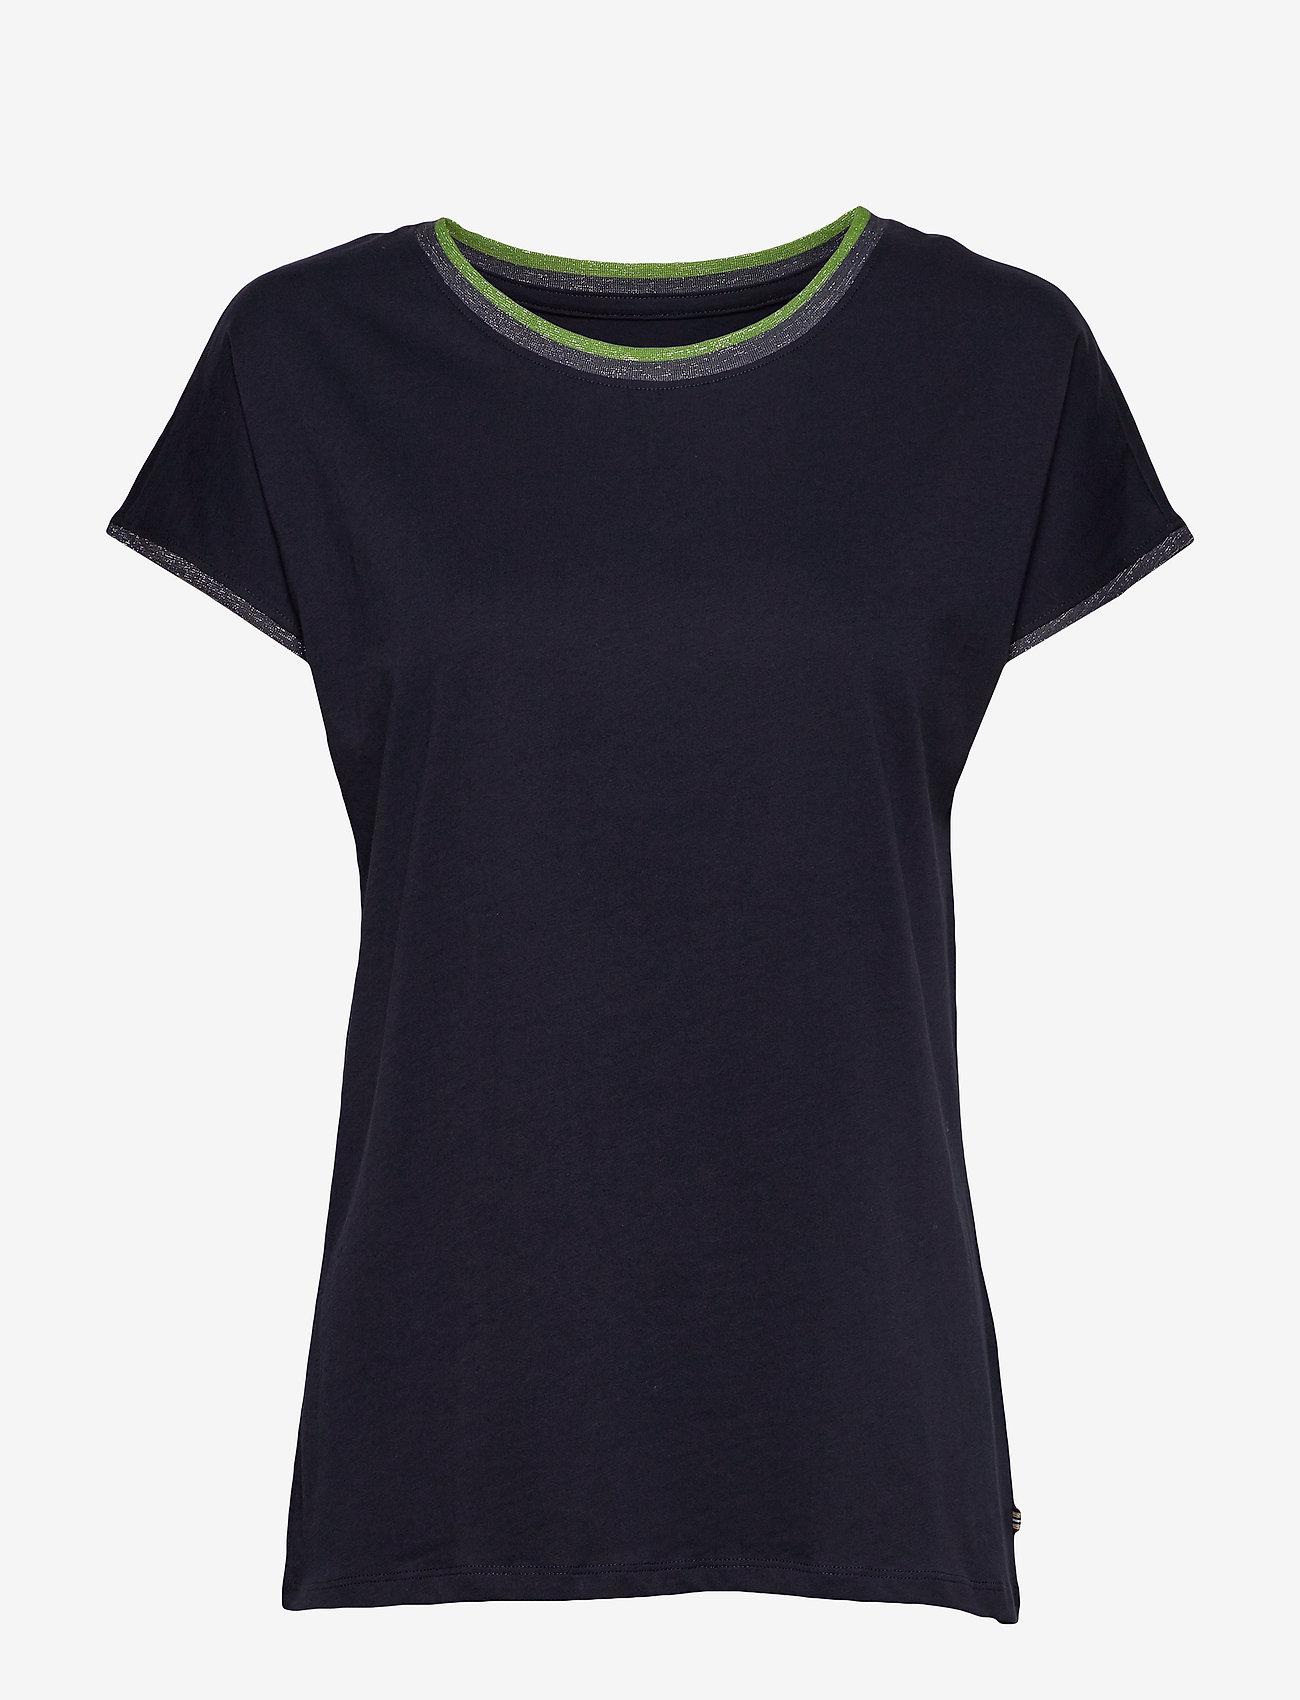 Esprit Casual - T-Shirts - t-shirts - navy - 0